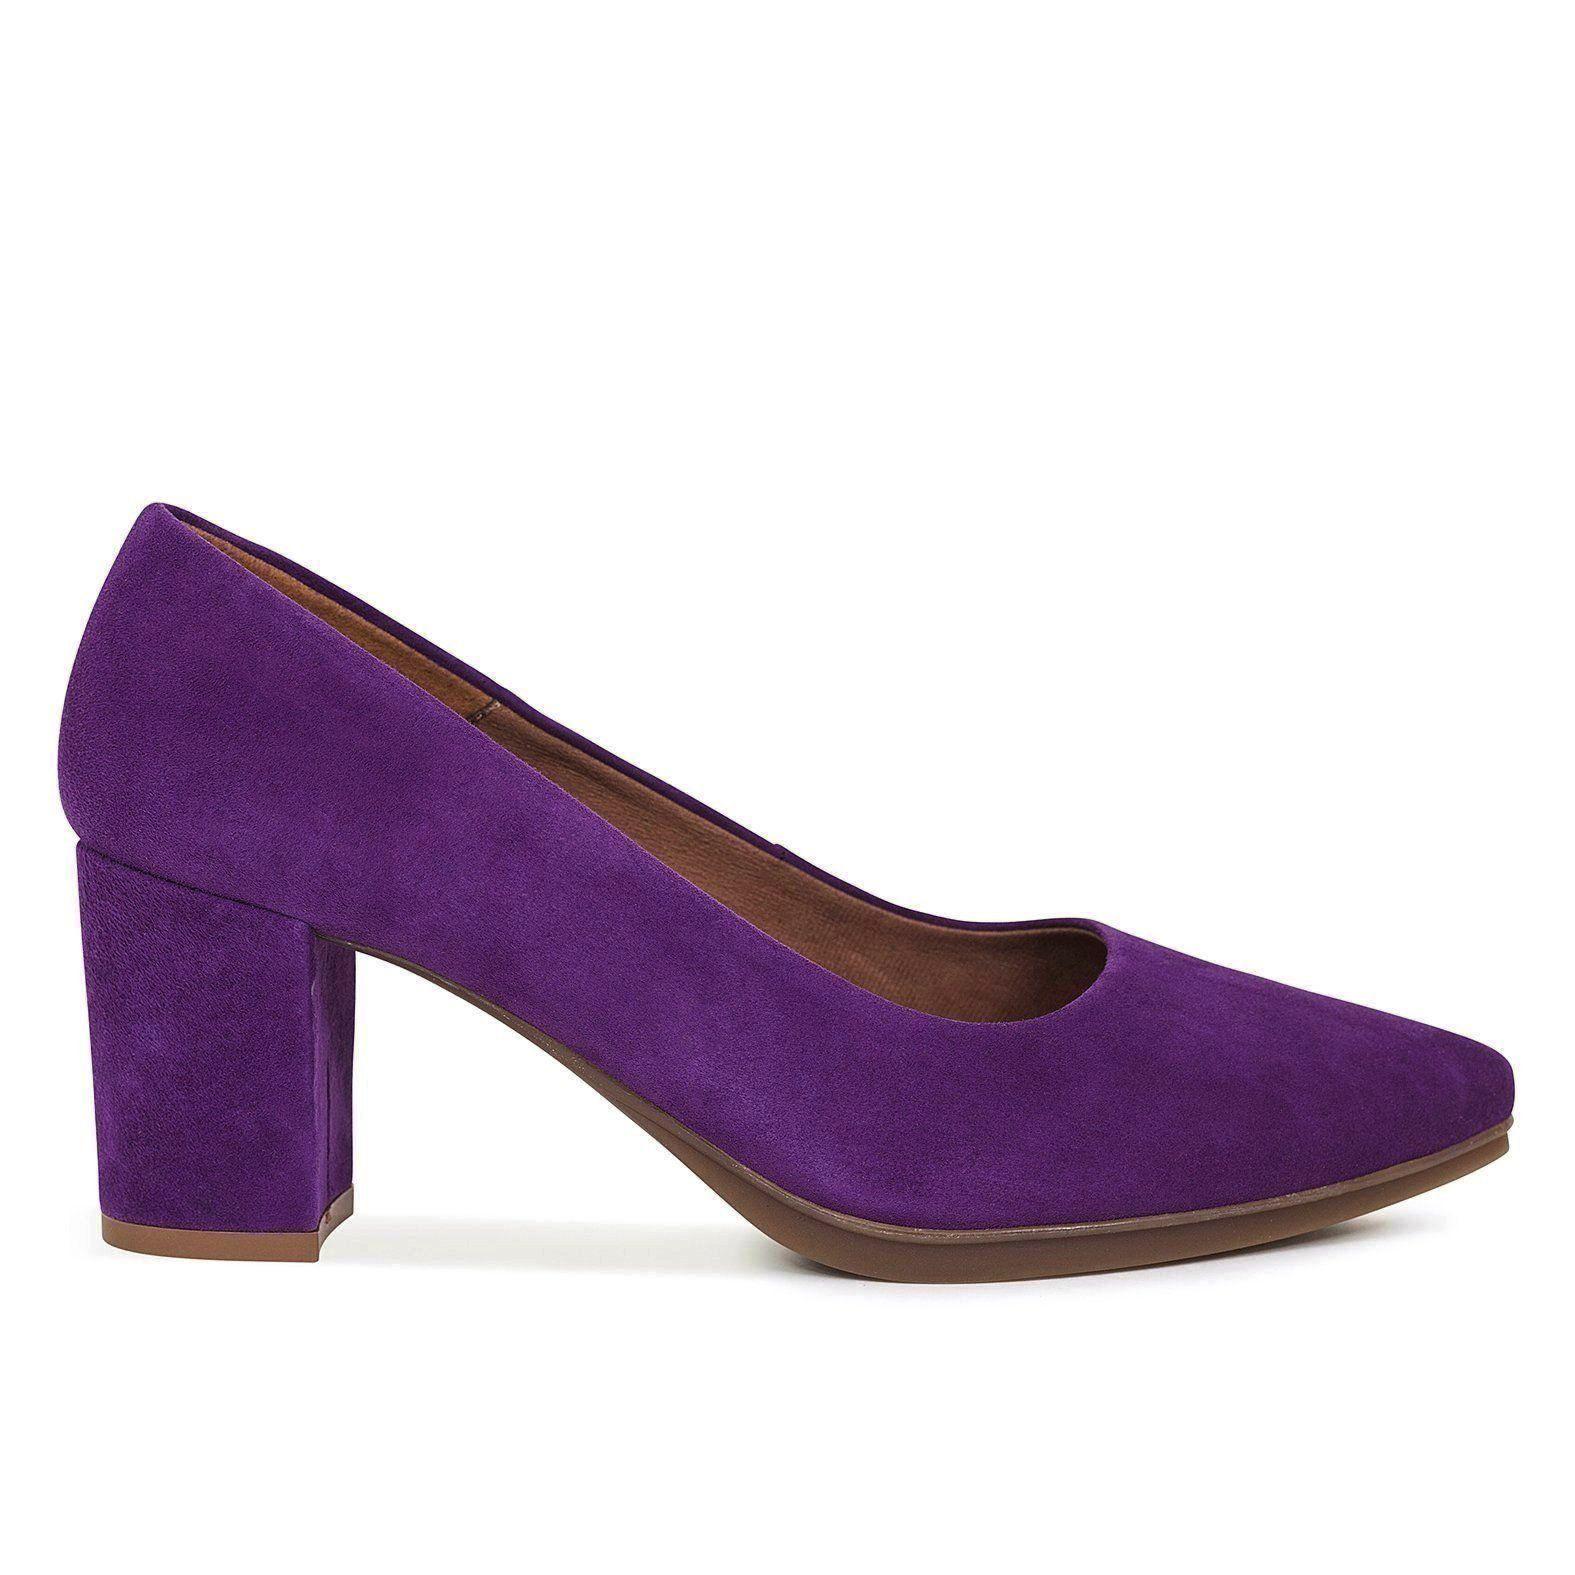 d57852cf Zapatos mujer tacón bajo MORADO OSCURO Urban S - Zapatos online miMaO –  miMaO ShopOnline